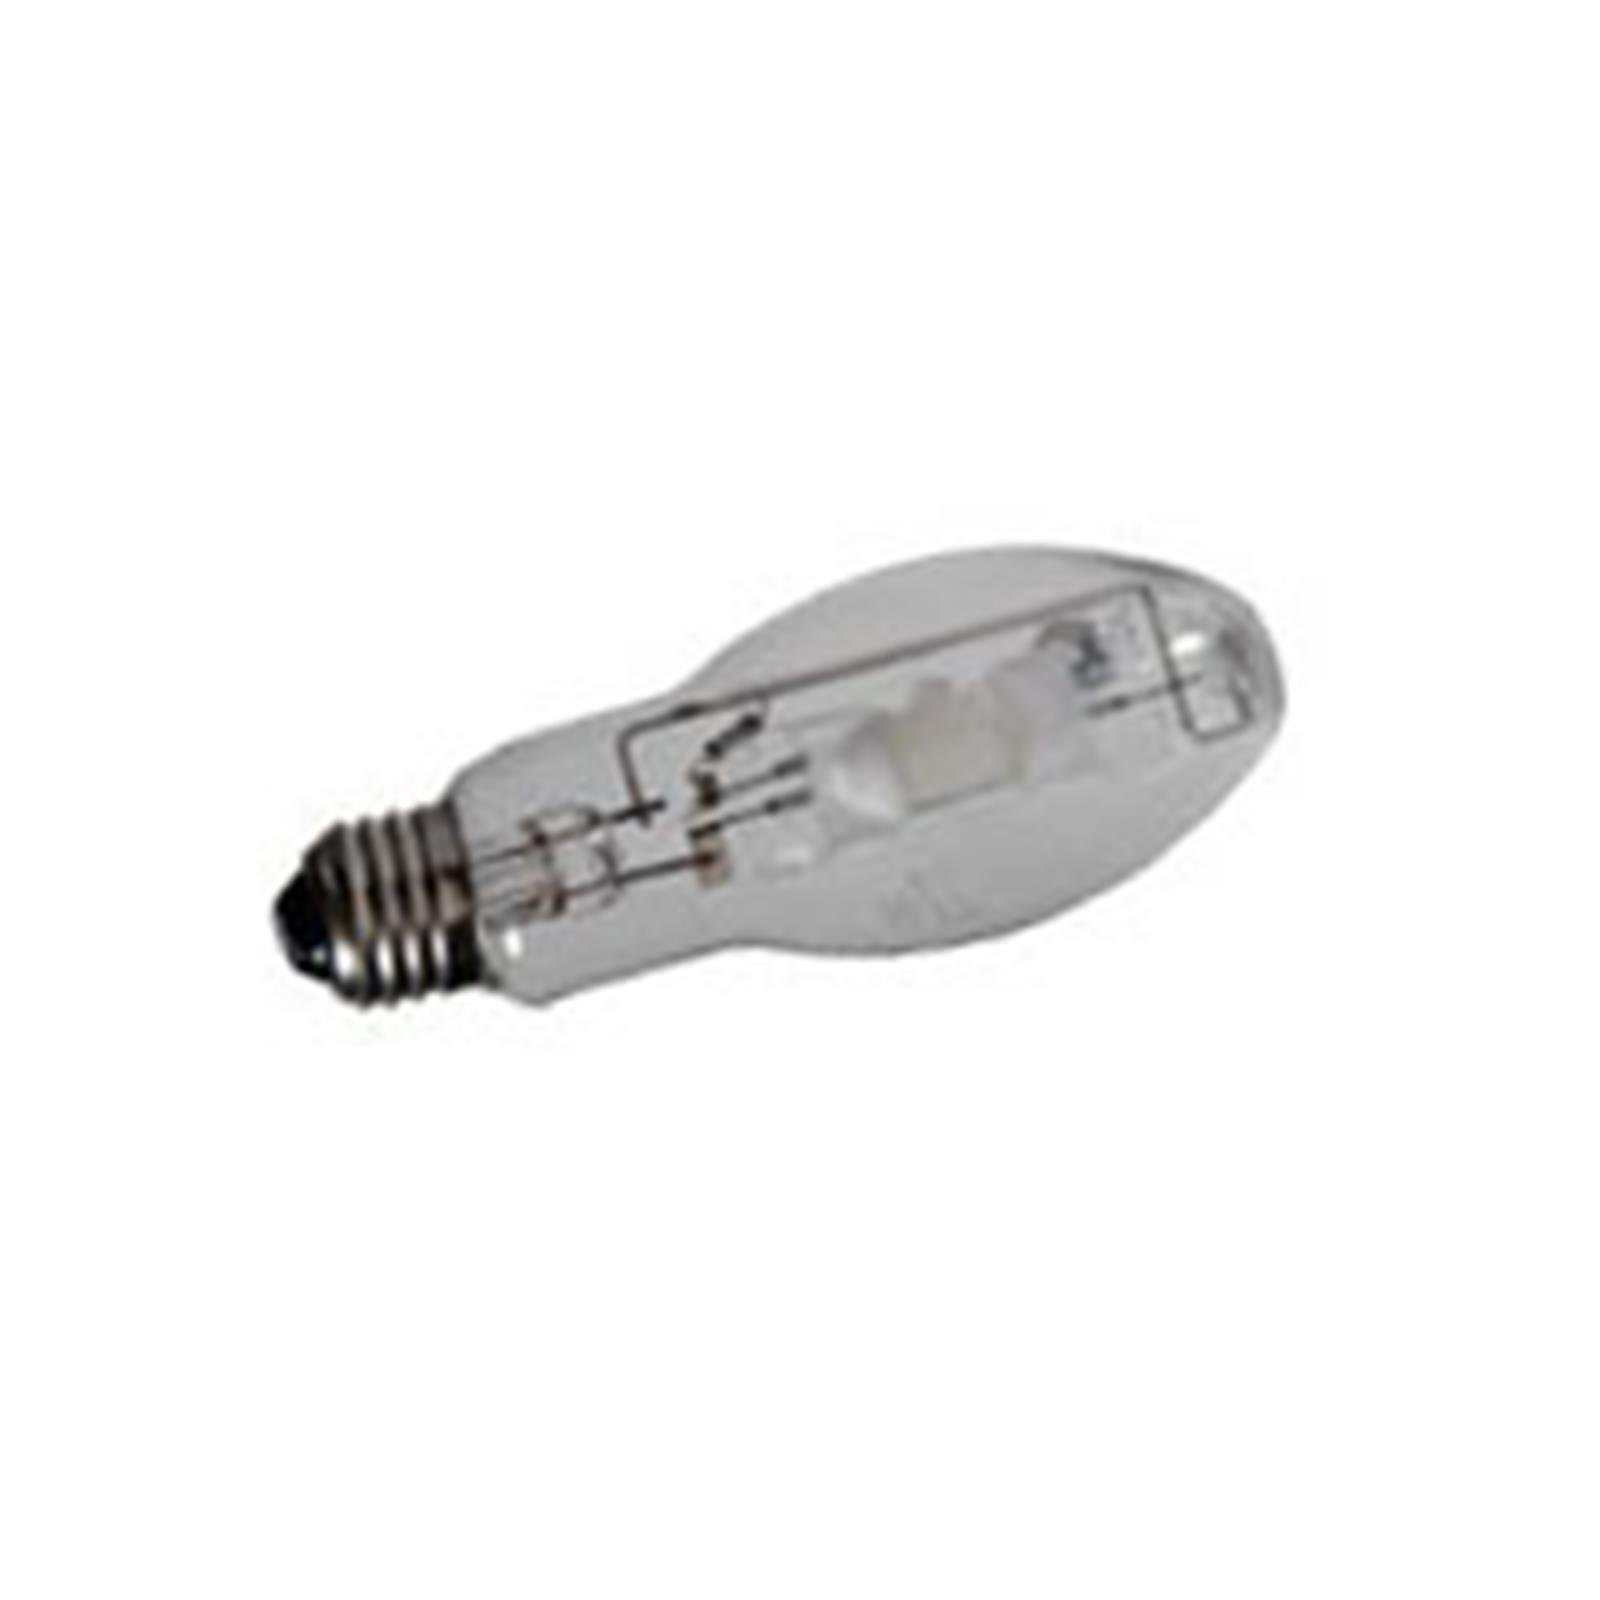 12 Qty. Halco 400W MH ED28 MOG ProLume M59/E MH400/U/ED28 400w HID Standard Clear Lamp Bulb